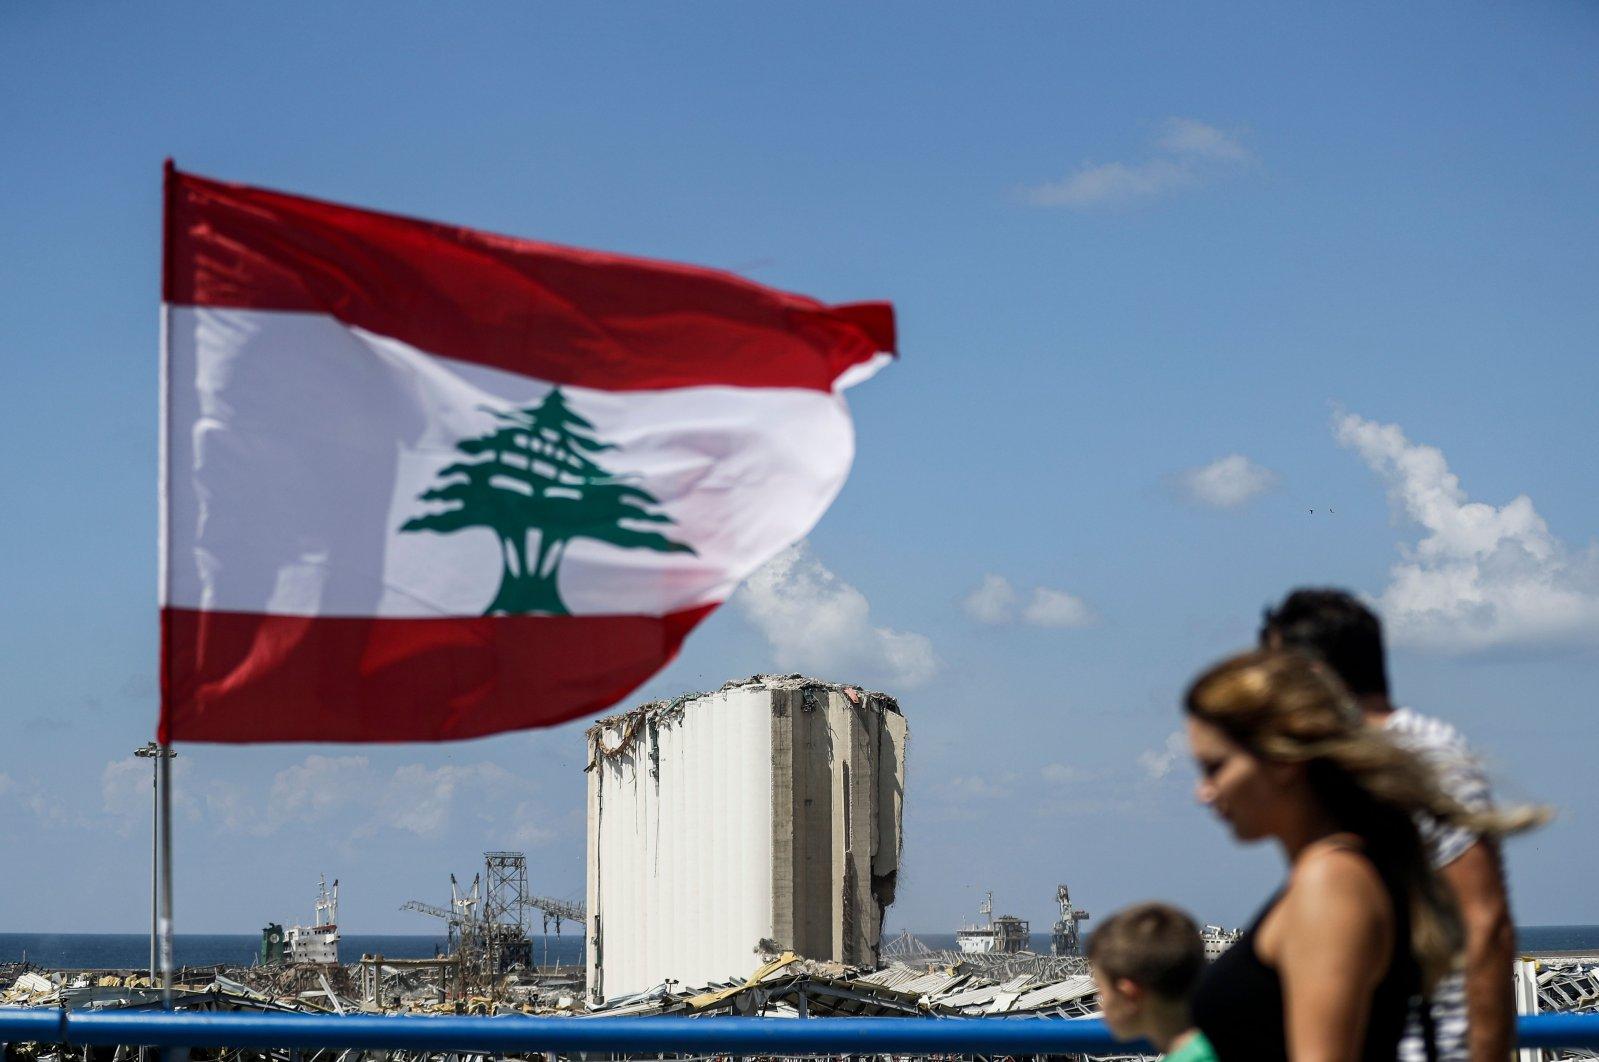 People walk along a bridge past a Lebanese flag flying near the port of Lebanon's capital Beirut as damaged grain silos in the background, Beirut, Lebanon, Aug. 9, 2020. (AFP Photo)